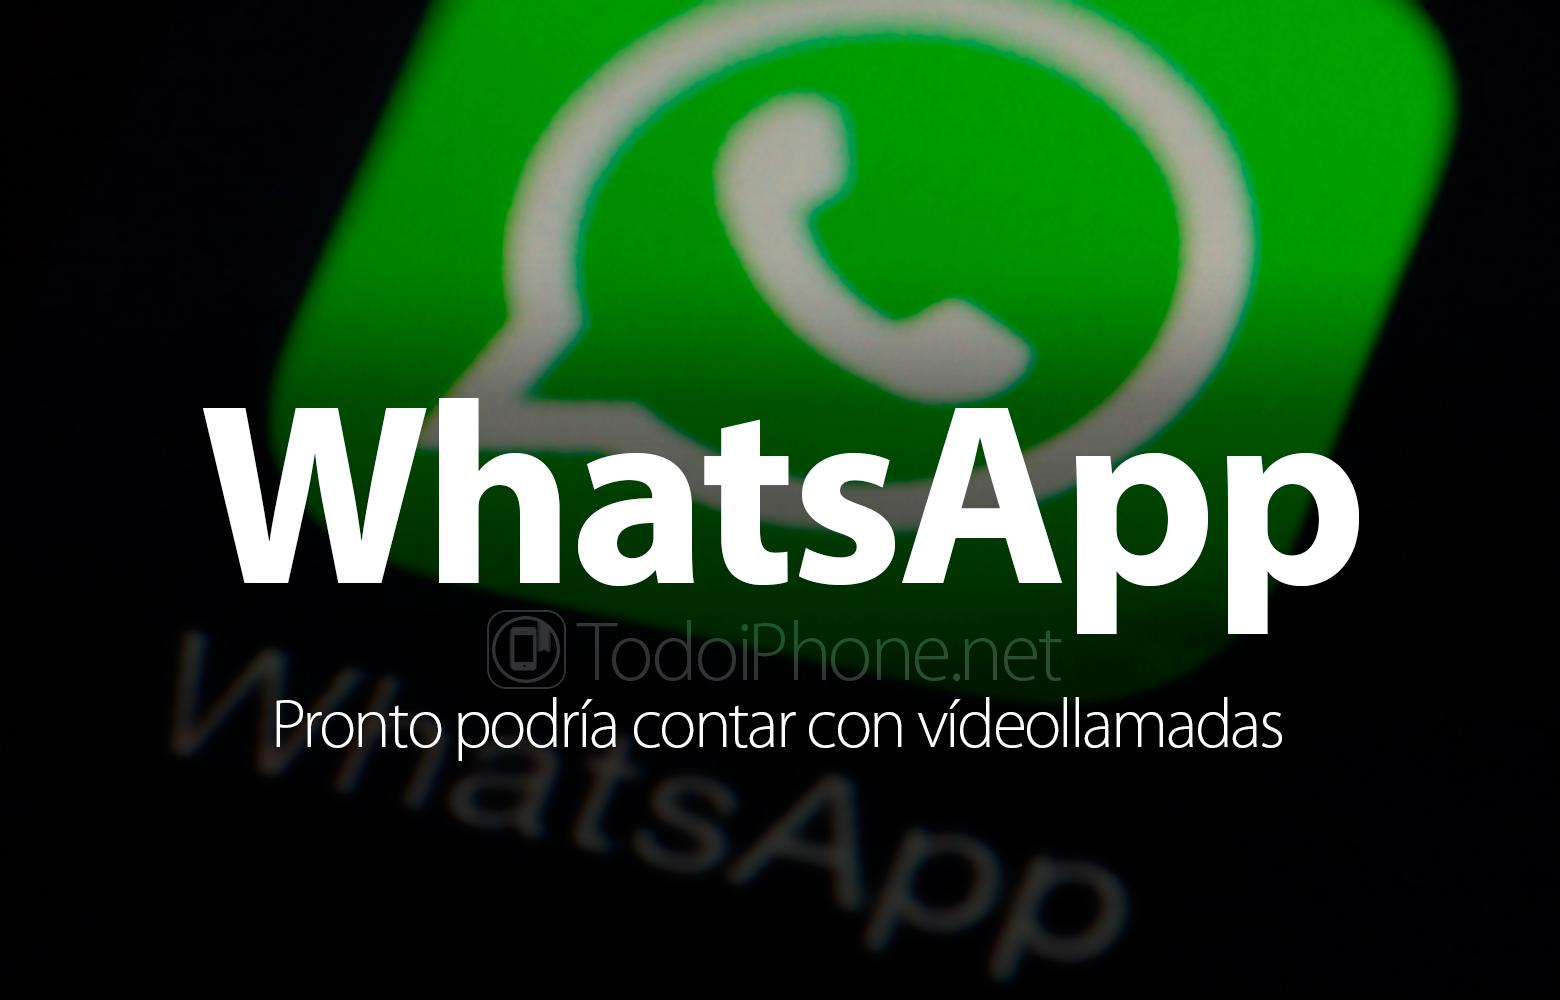 whatsapp-pronto-podria-contar-videollamadas